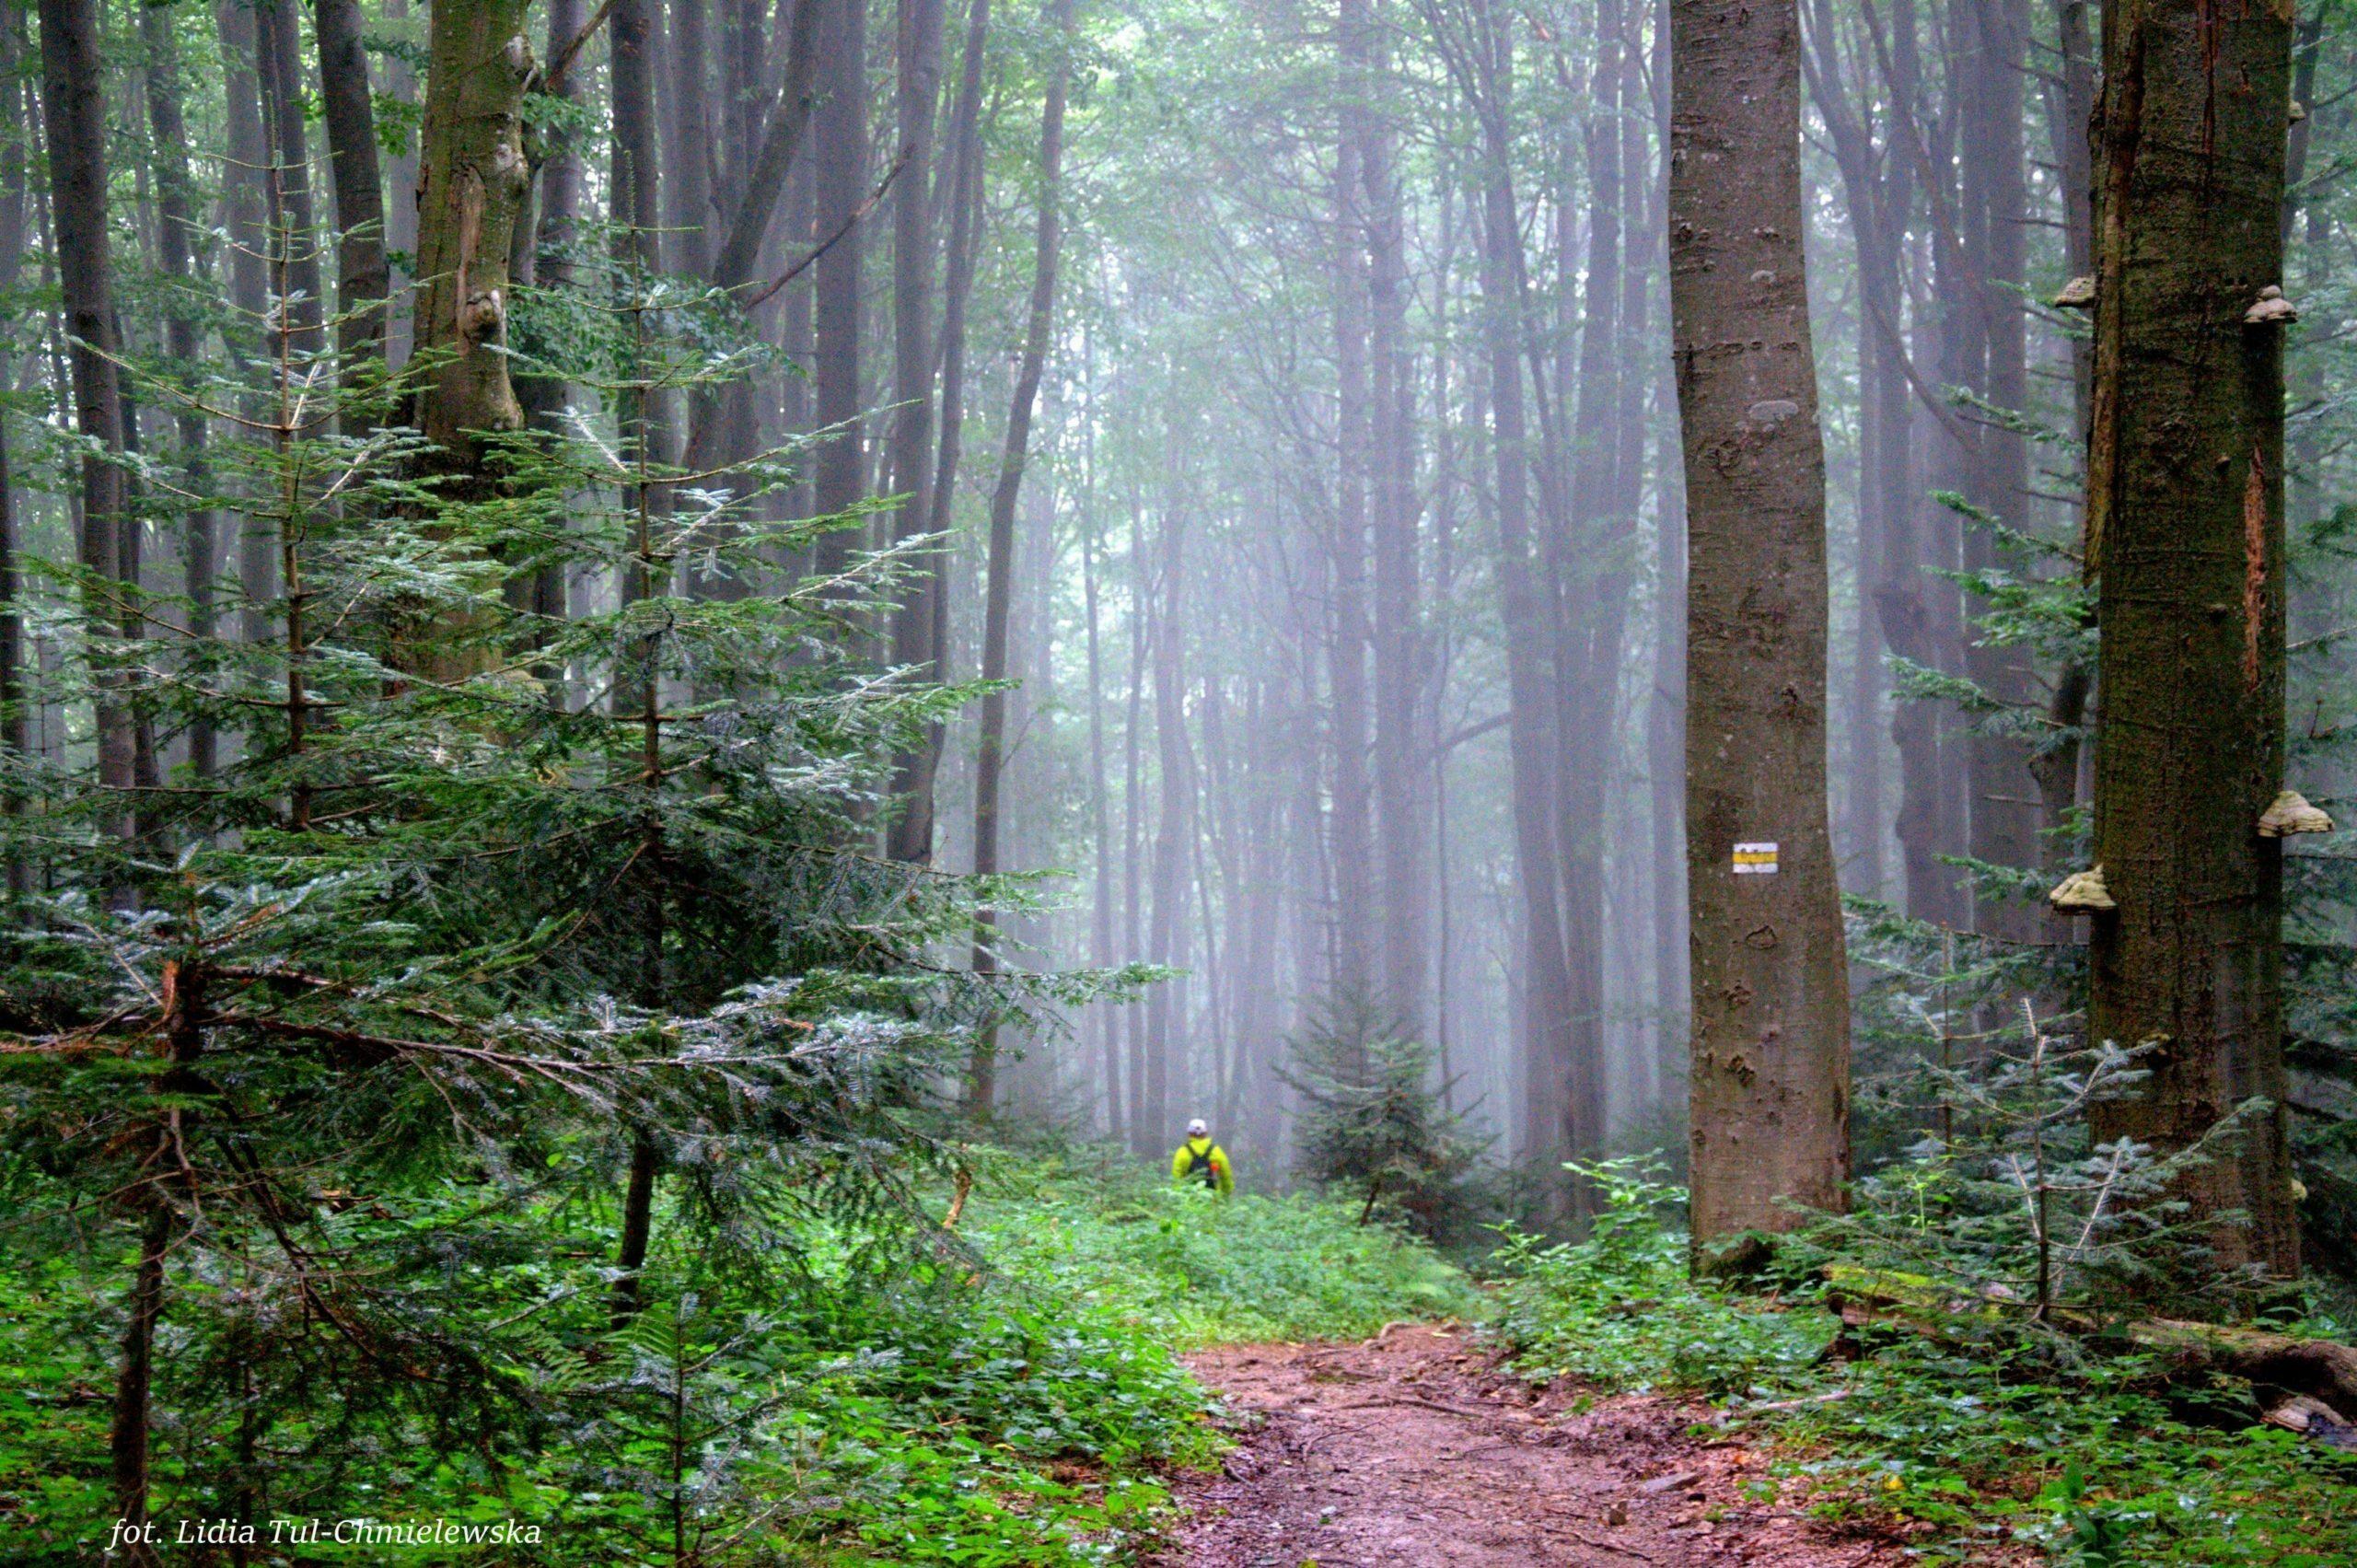 Mgła w lesie/ fot. Lidia Tul-Chmielewska